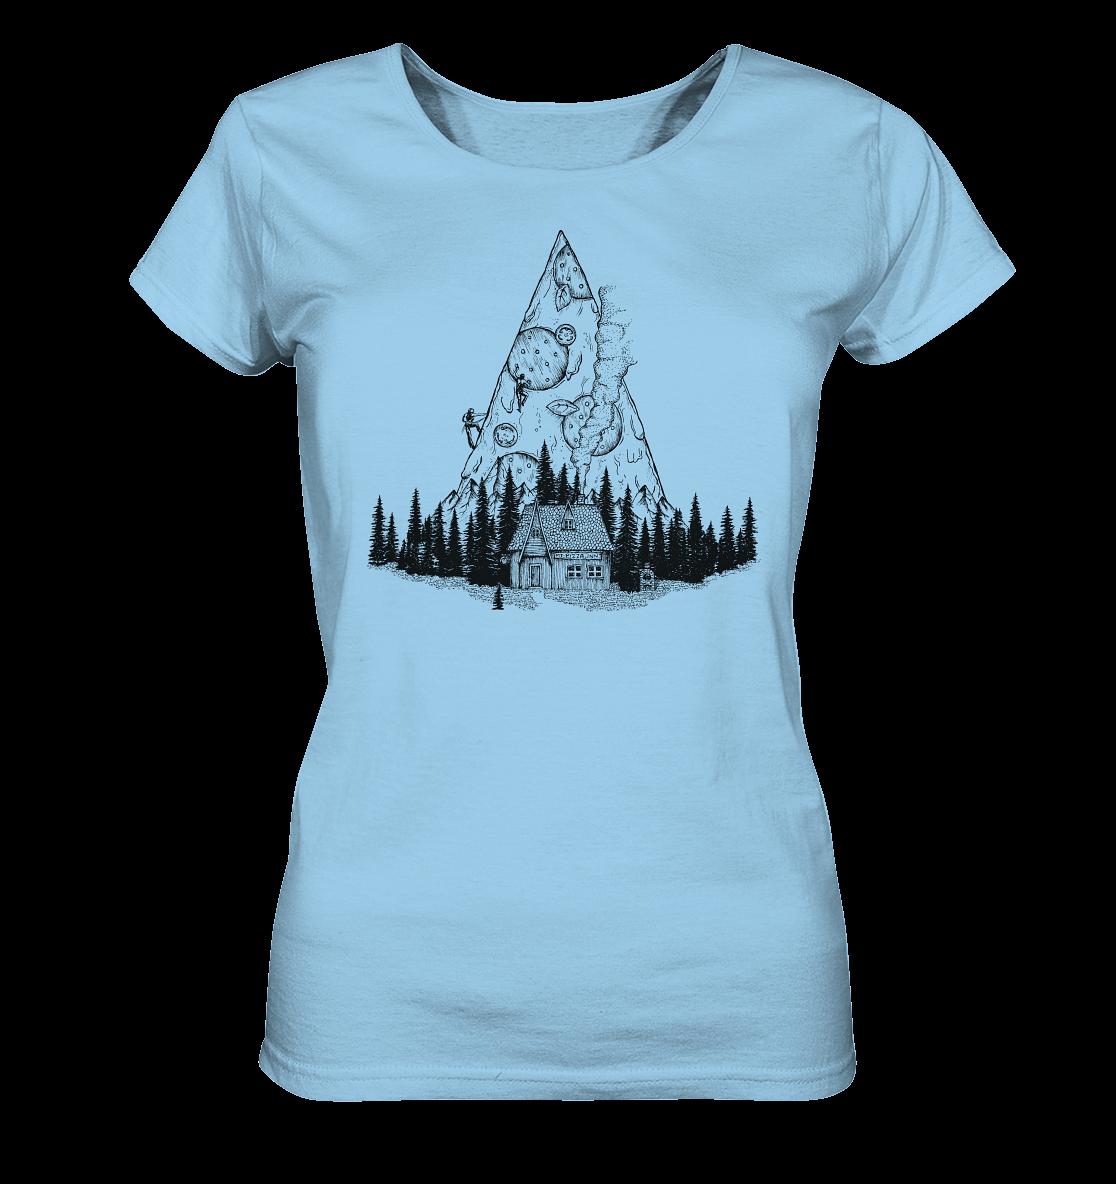 front-ladies-organic-shirt-9fd0ed-1116x-6.png